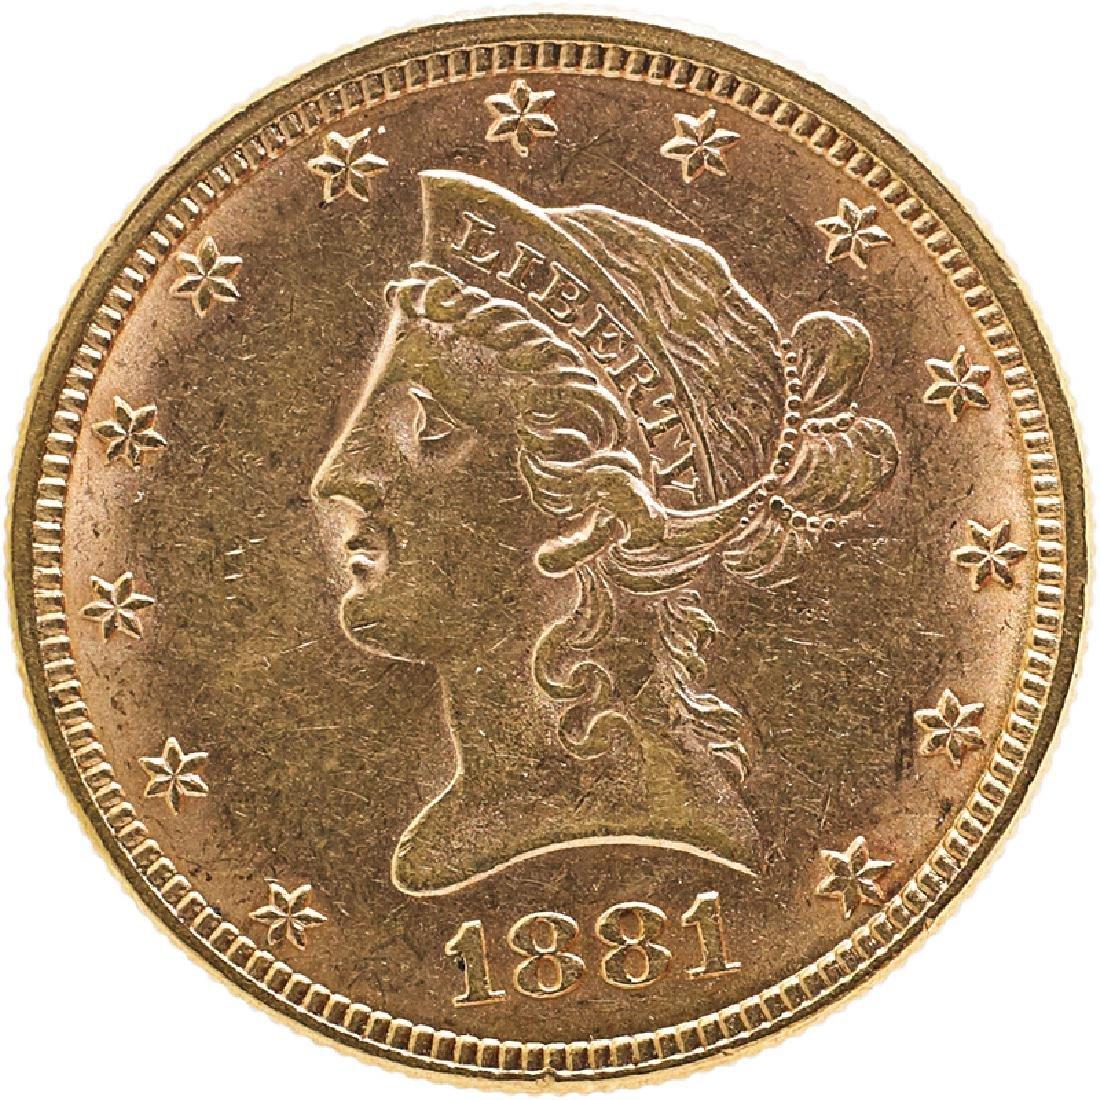 U.S. 1881 LIBERTY $10 GOLD COIN